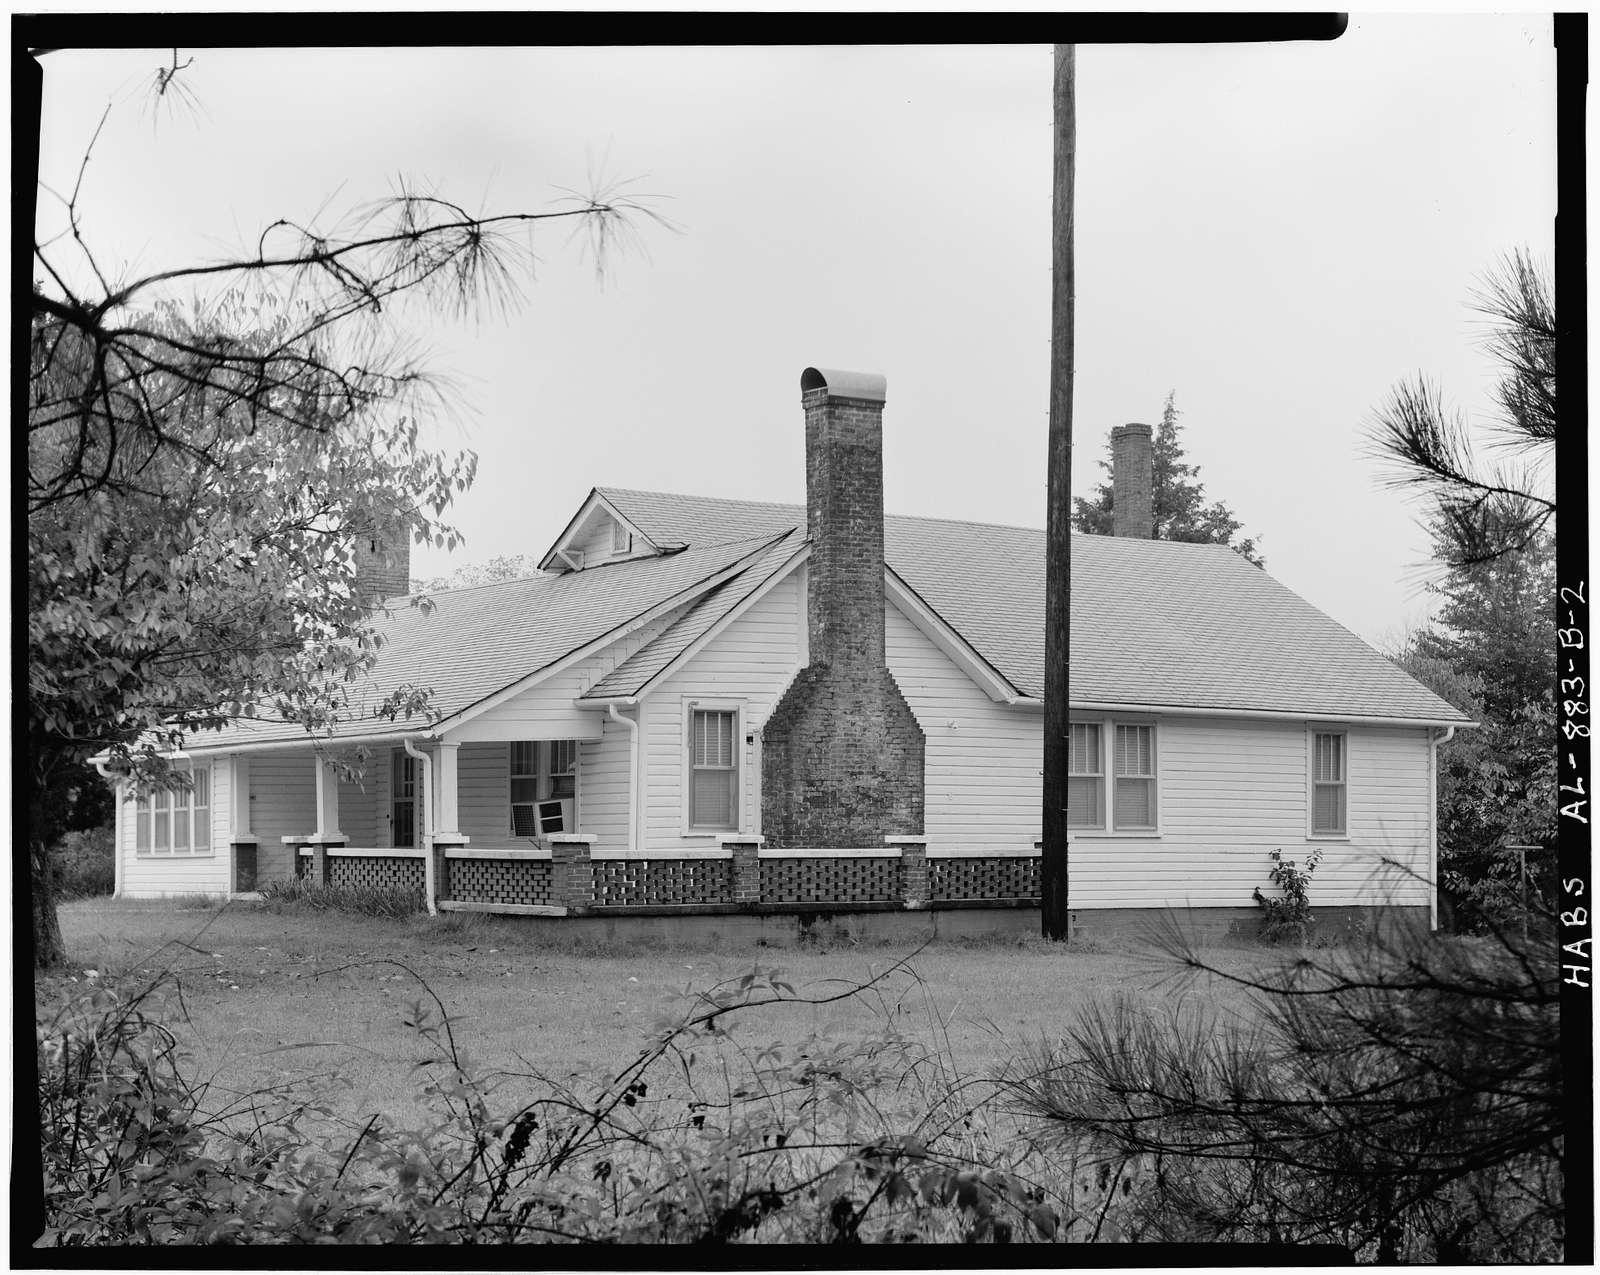 Redstone Arsenal, Harris Residence, Off Buxtia Road between Shields & McAlpine Roads, Huntsville, Madison County, AL